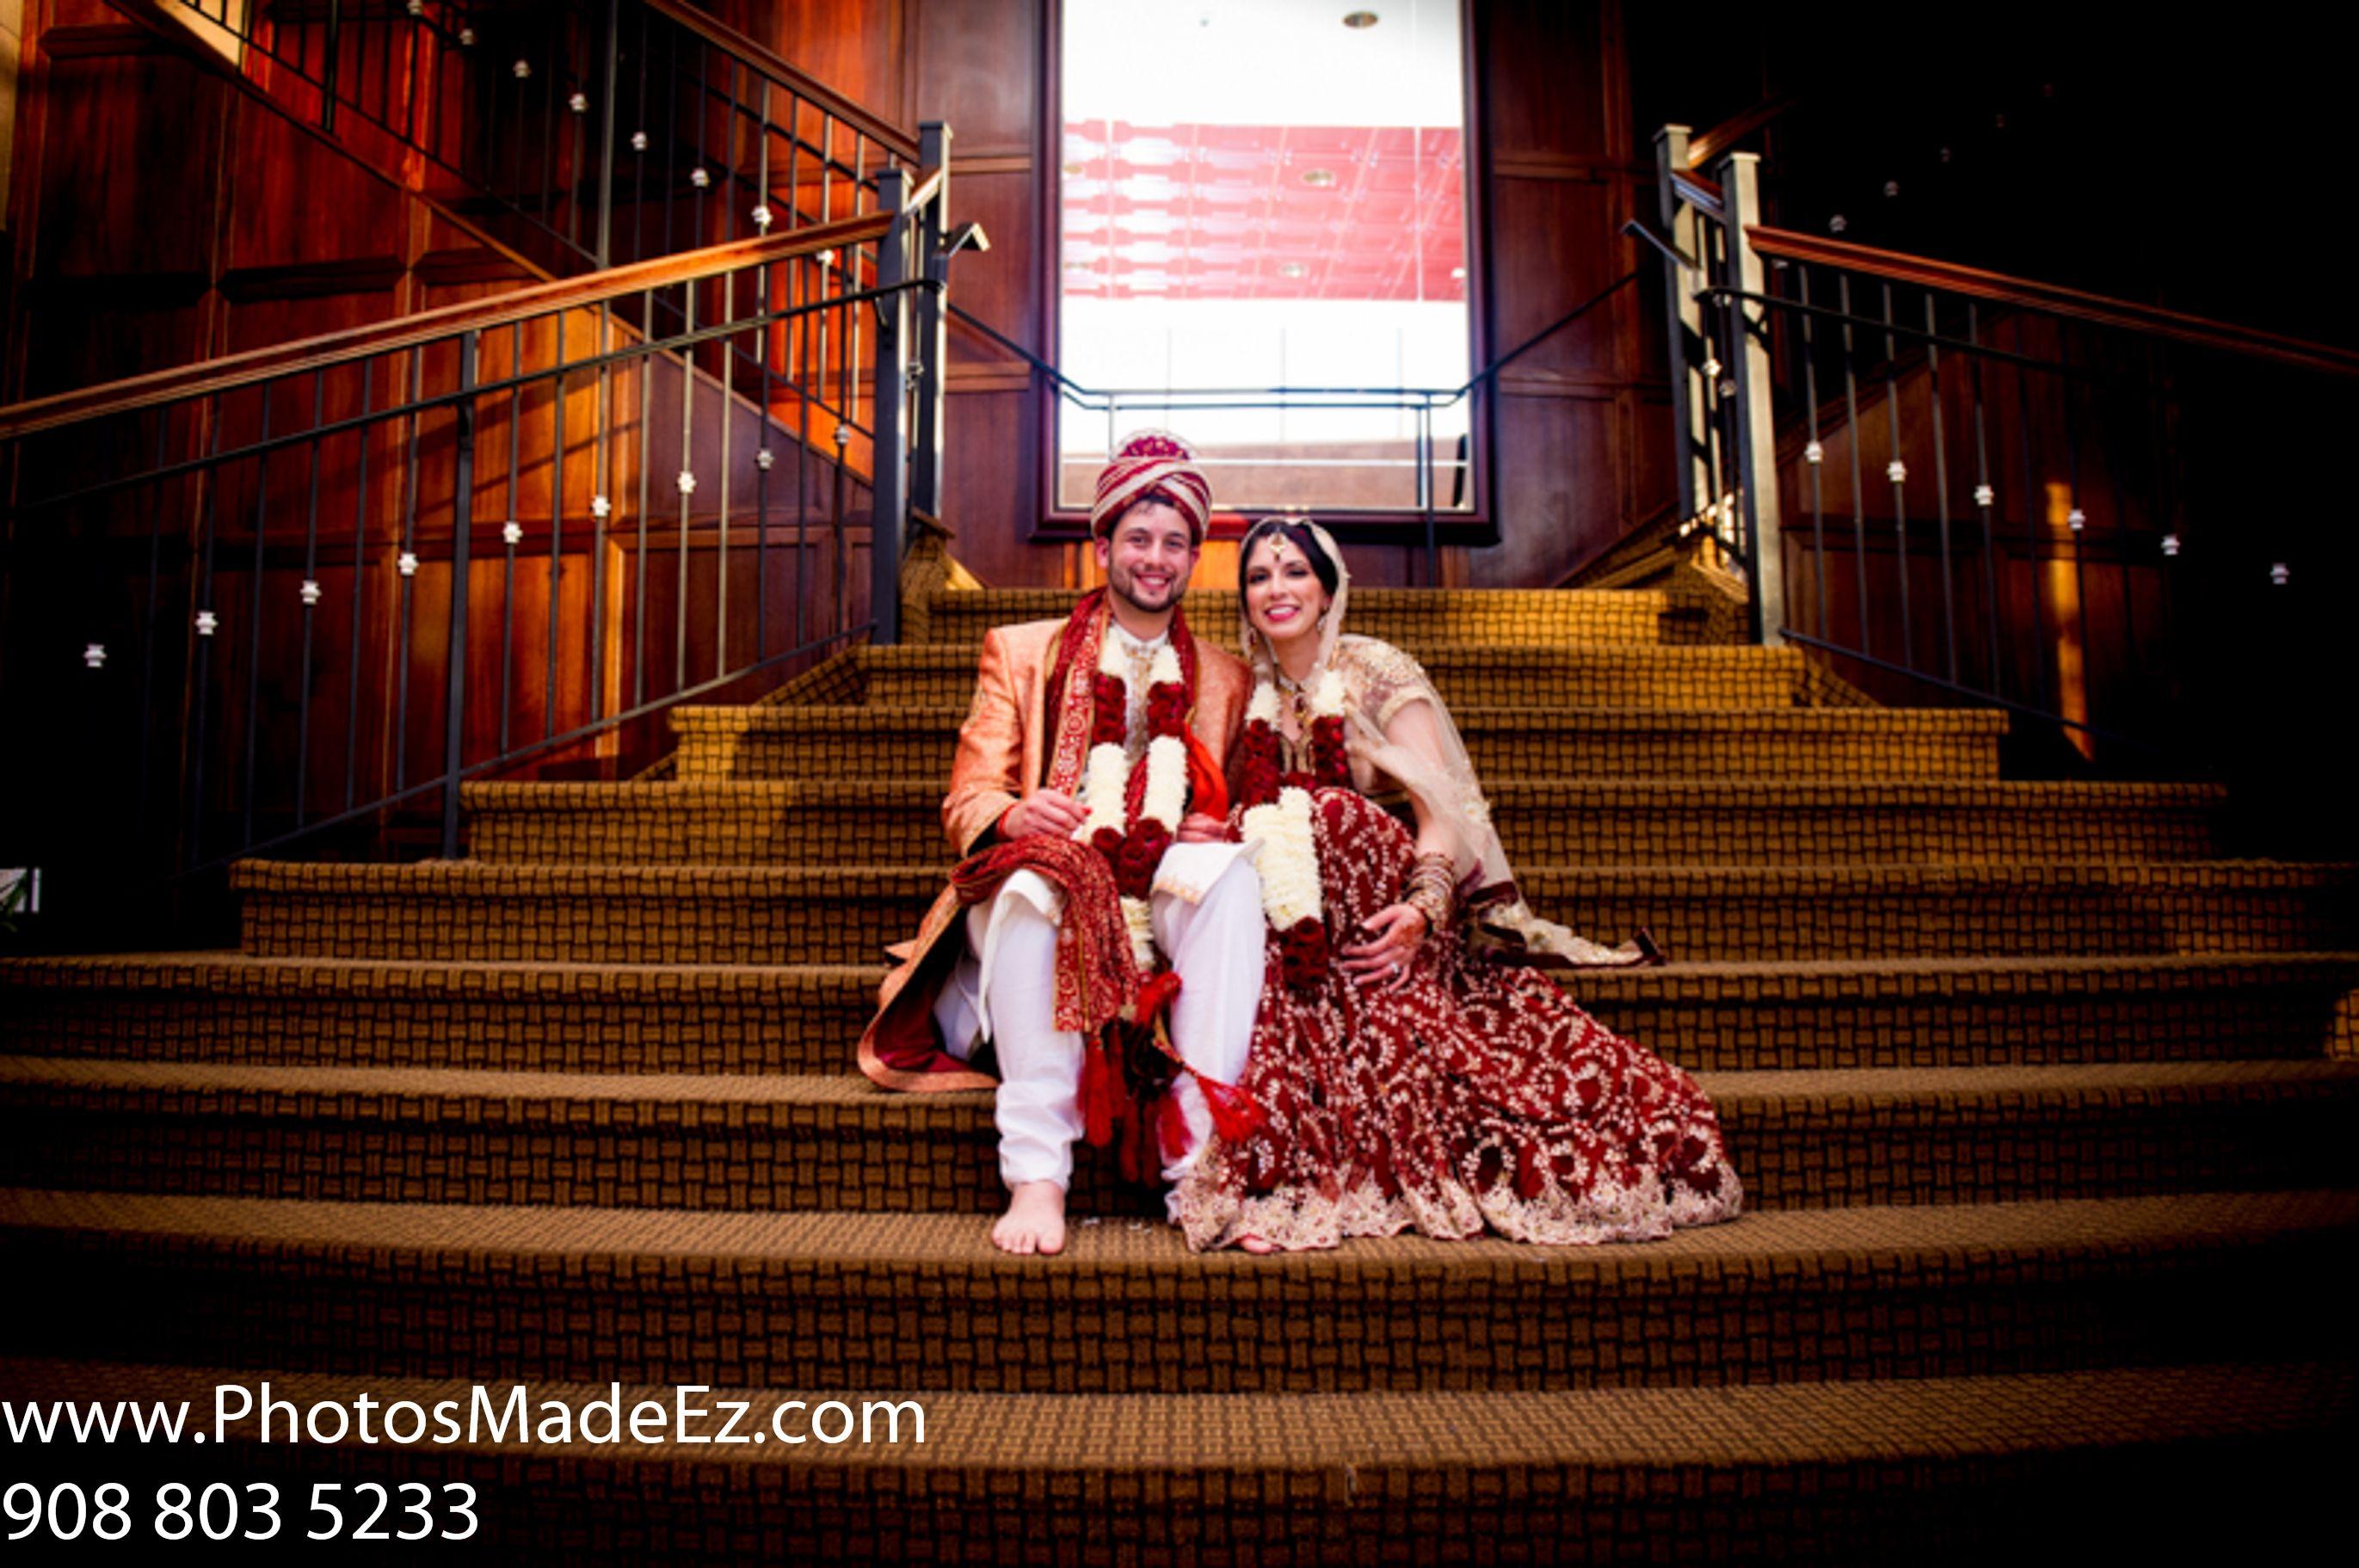 Indian/ Interfaith Wedding by PhotosMadeEz featured in Maharani Weddings in Sheraton Eatontown, NJ along with fellow vendors Kanwal Batool, Elegant Affairs, Mughal Catering.